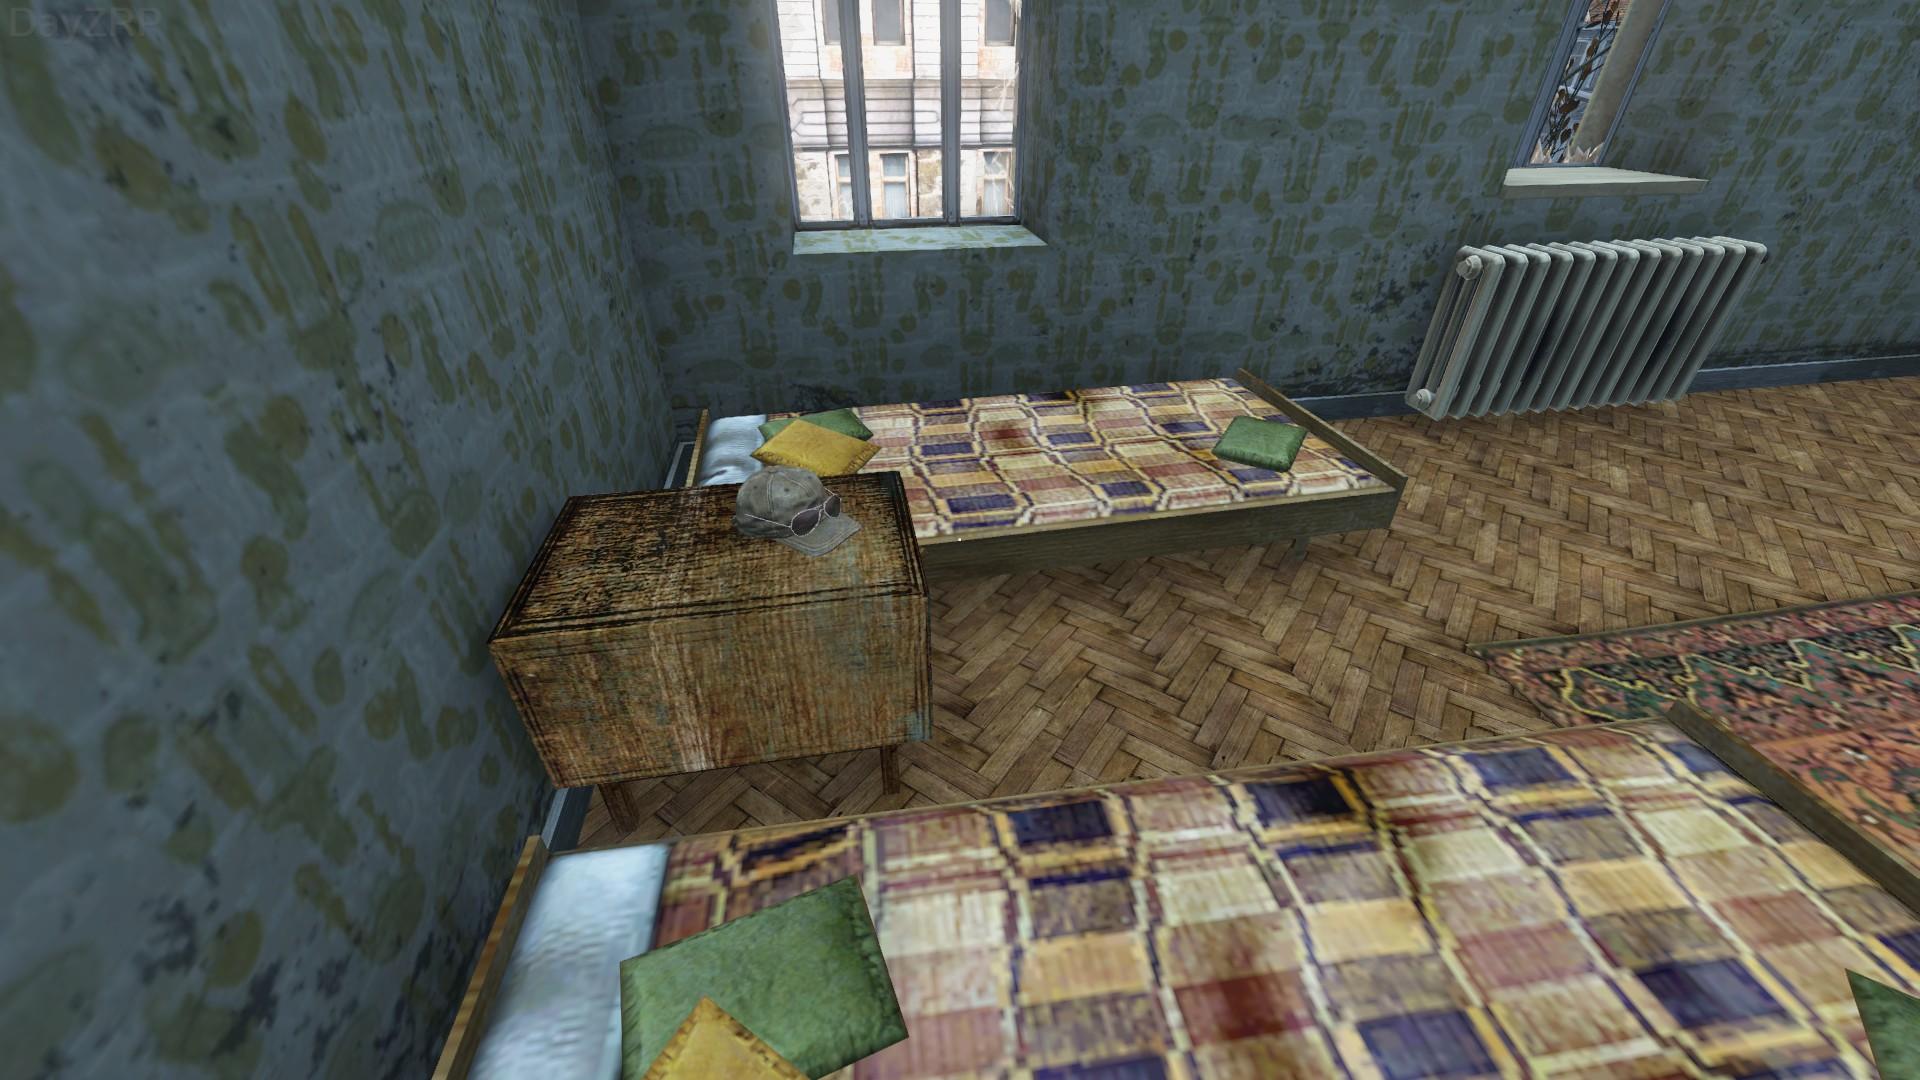 168063773_BedroomDecorations.jpg.6dcd13055c3d352866265f32ff72e1fc.jpg